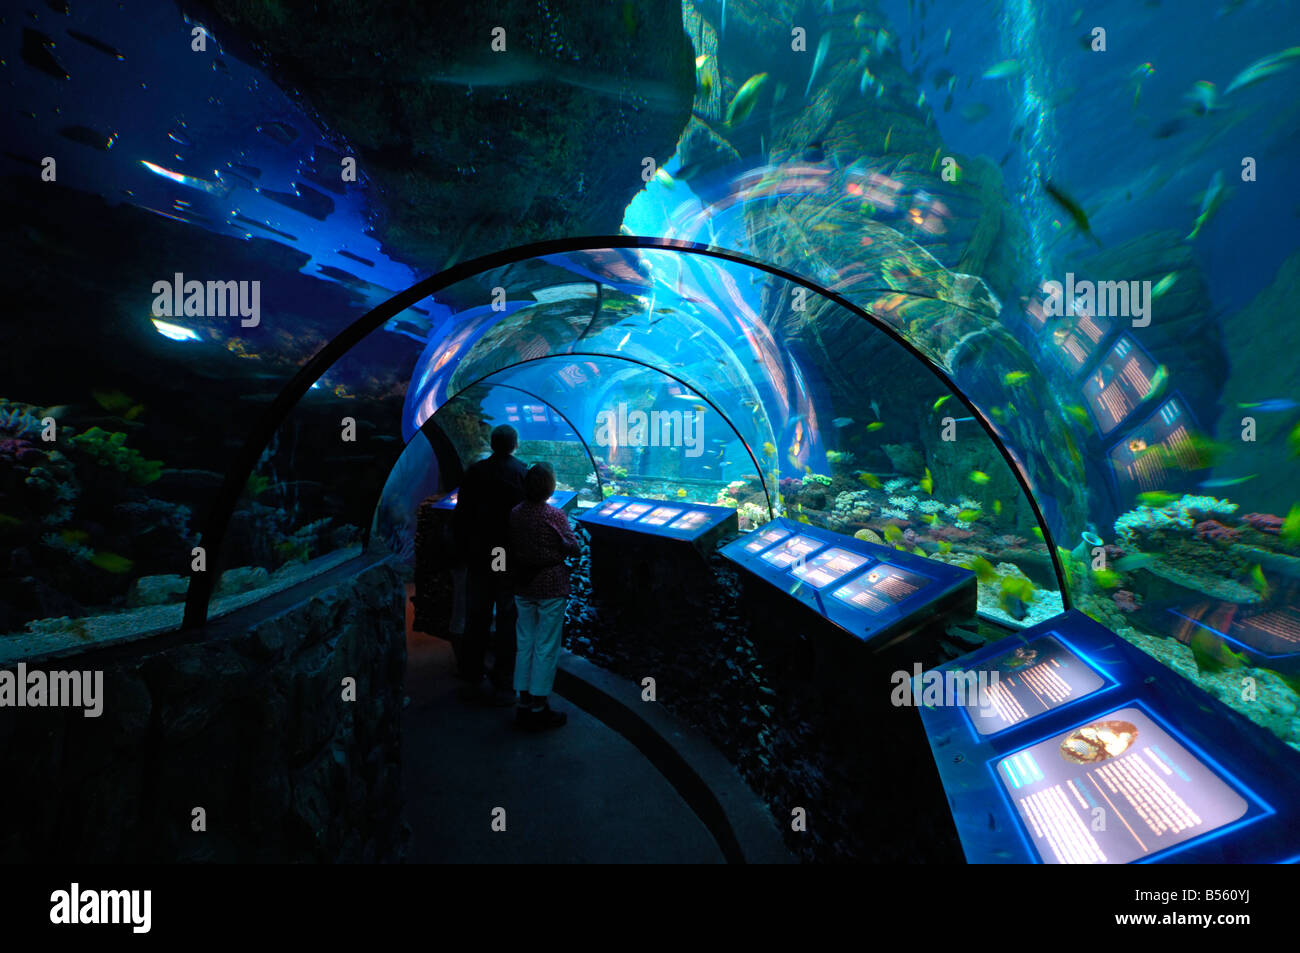 Sealife center, Olympiapark, Munich, Munchen, Germany - Stock Image